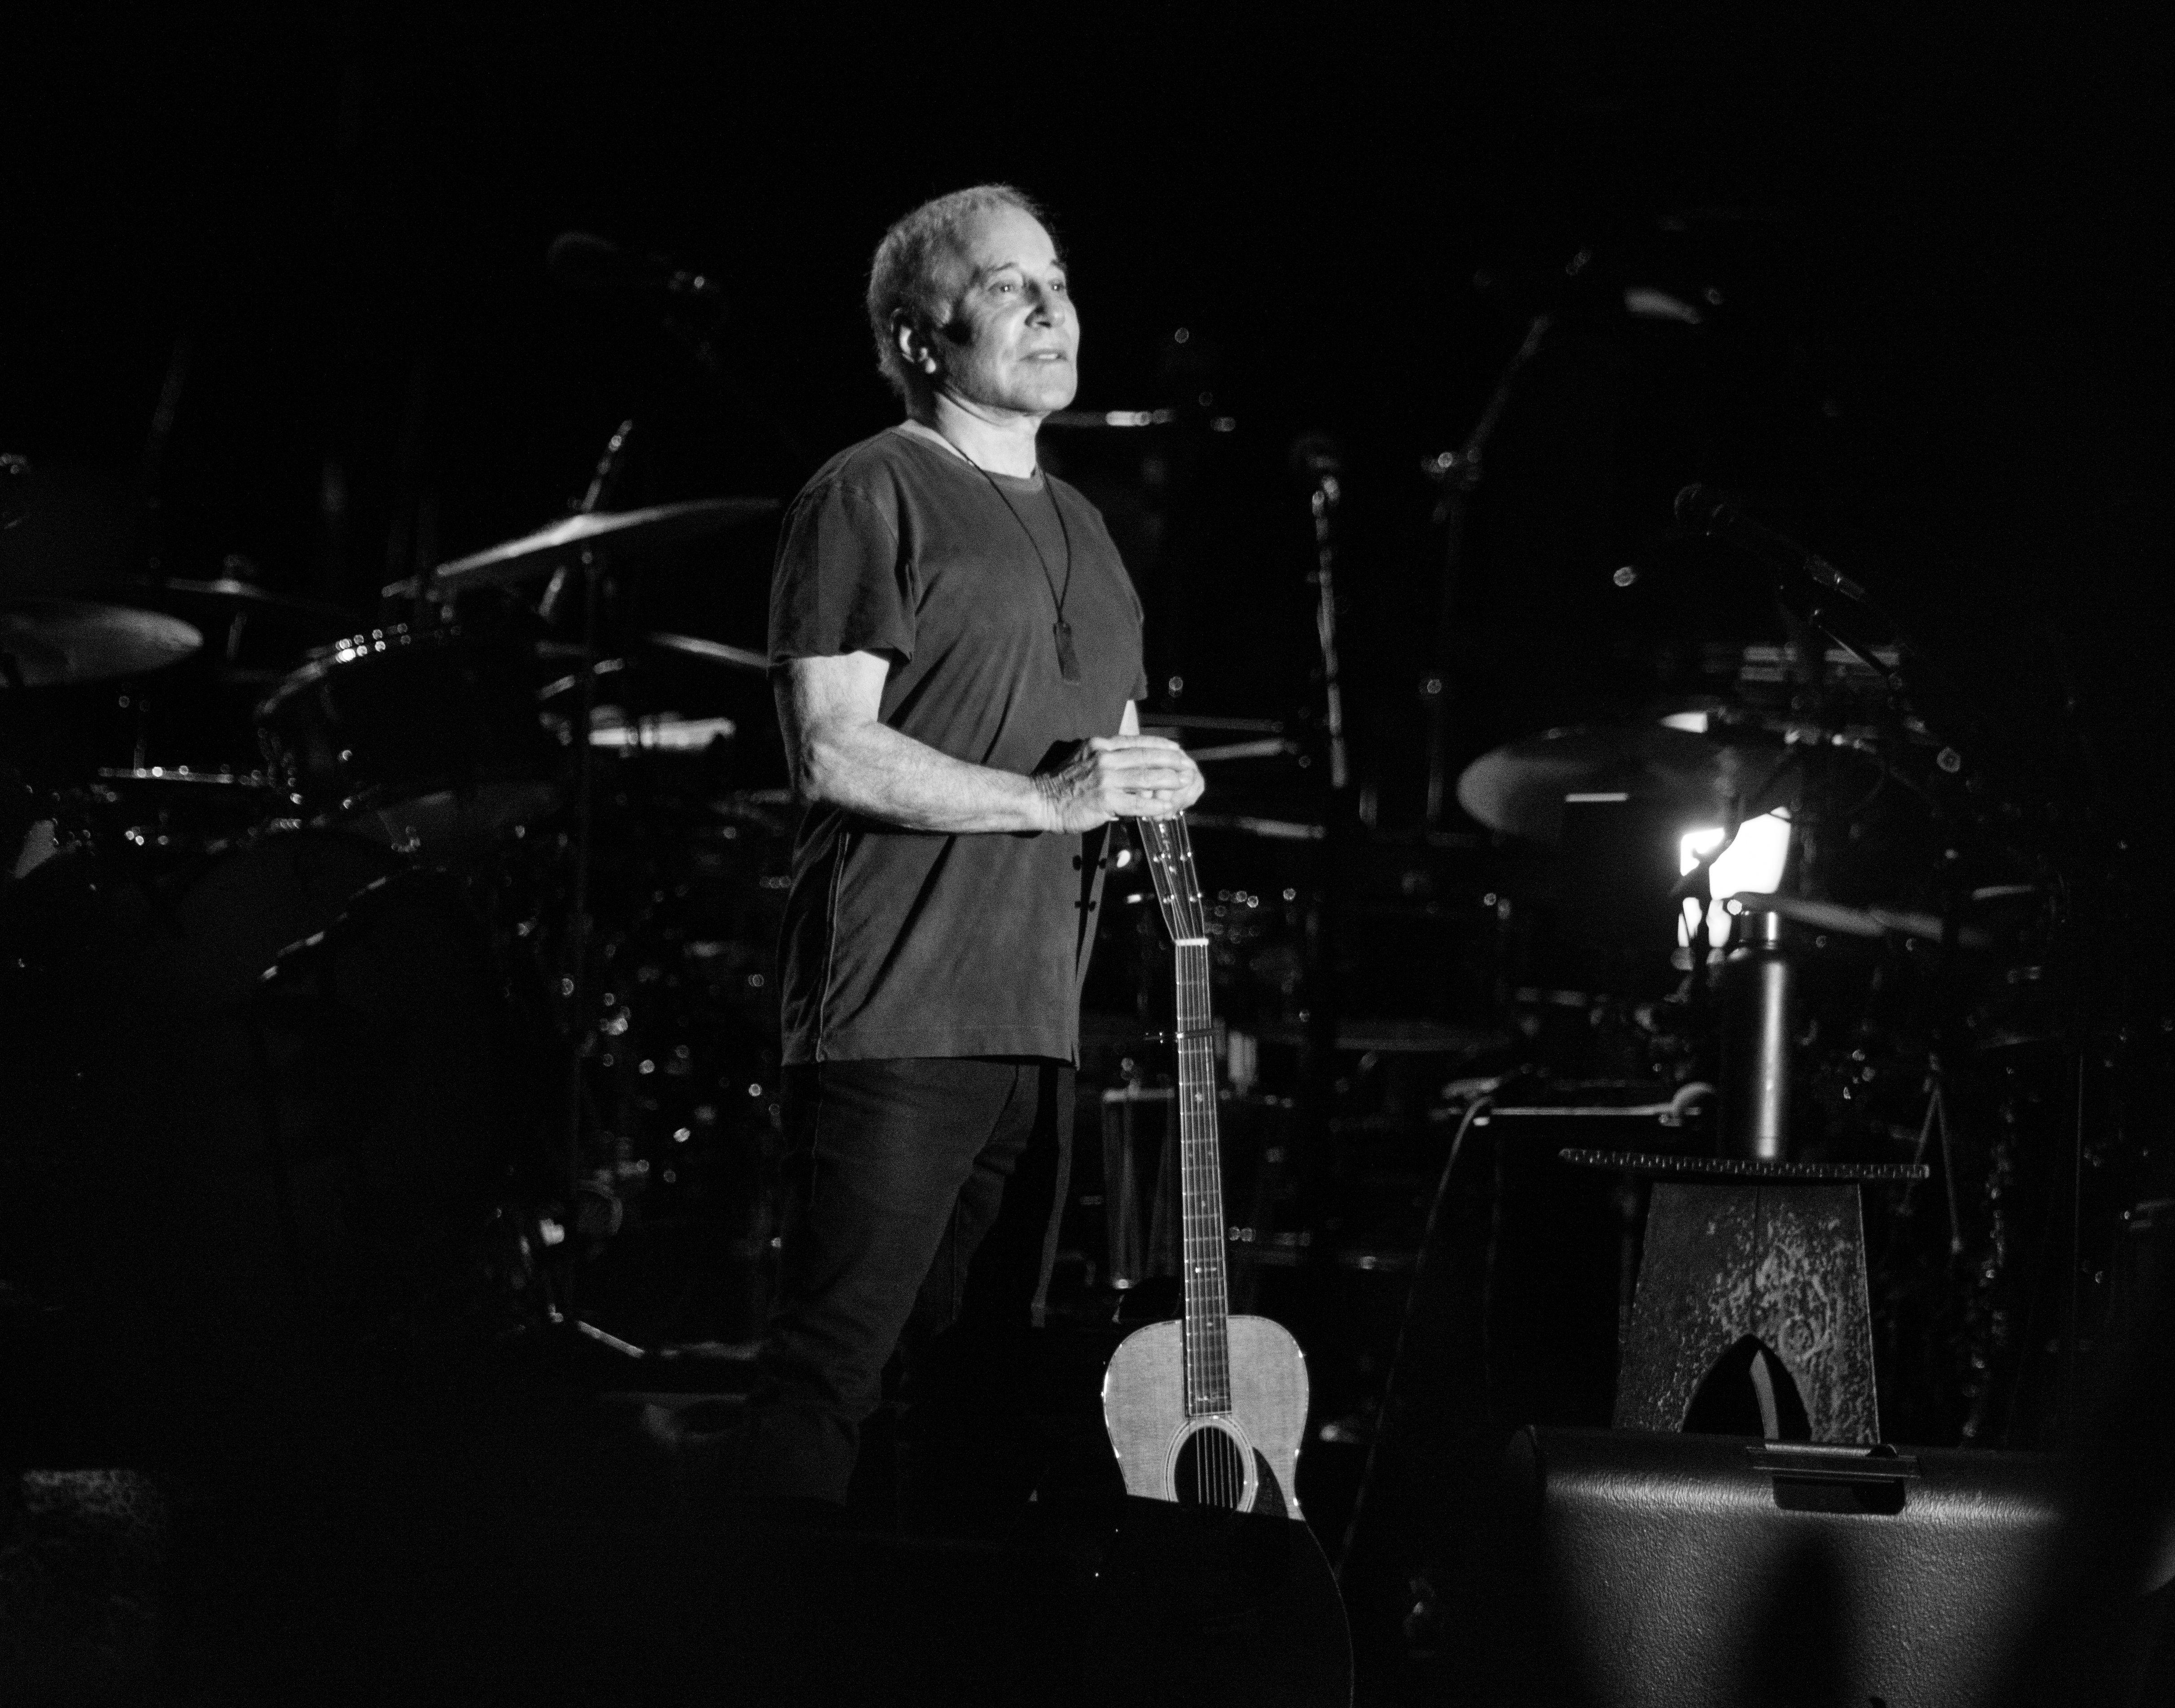 Paul Simon Donated $1 Million to Fund a New Music Education Program